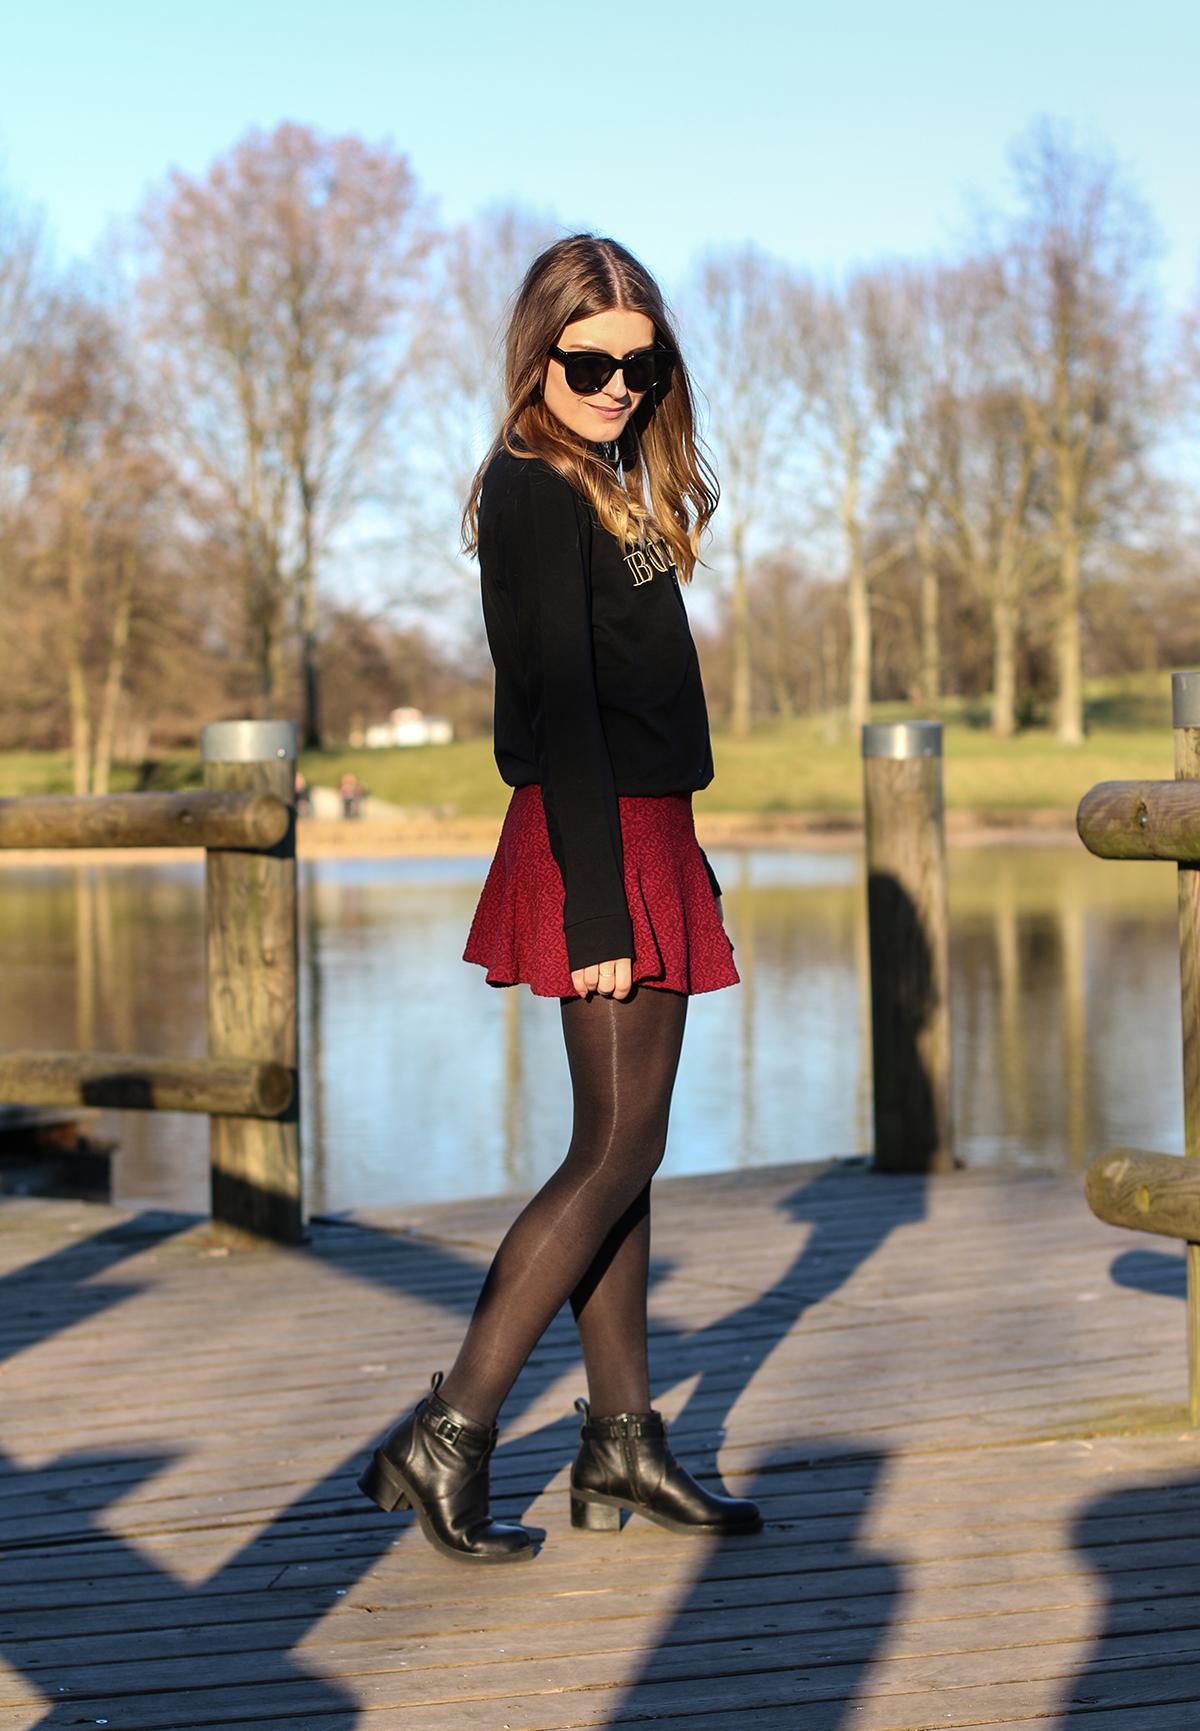 Winered_Skirt_4